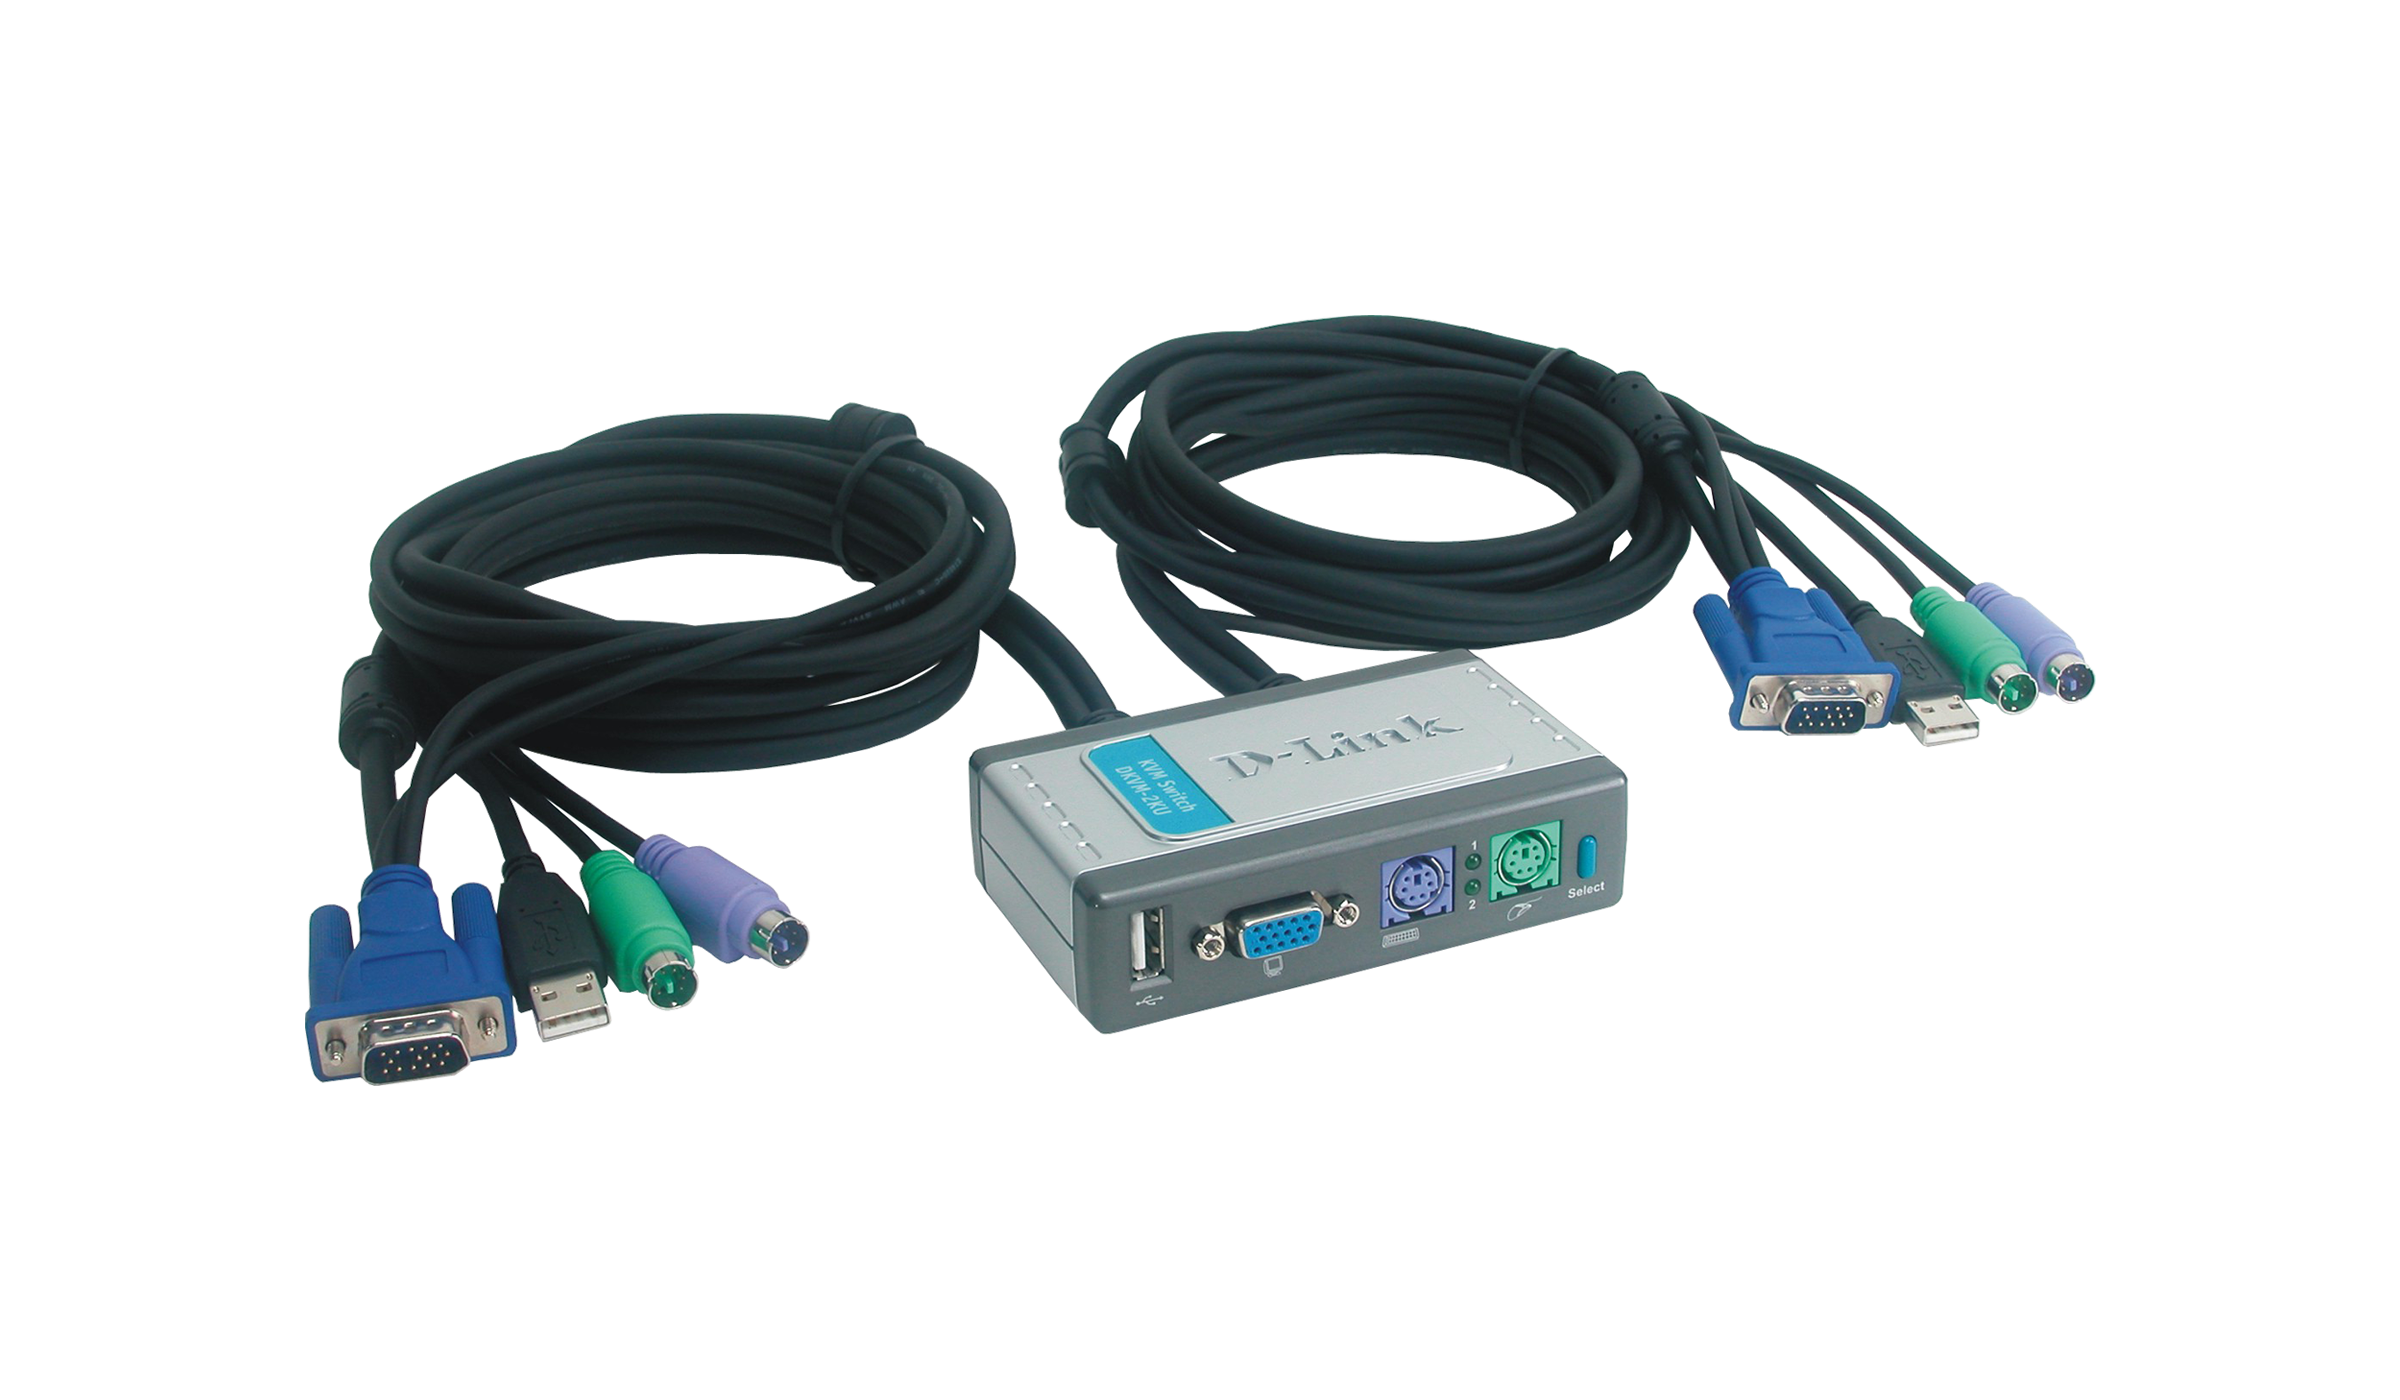 DKVM-2KU 2-Port KVM Switch mit USB 2.0   D-Link Deutschland